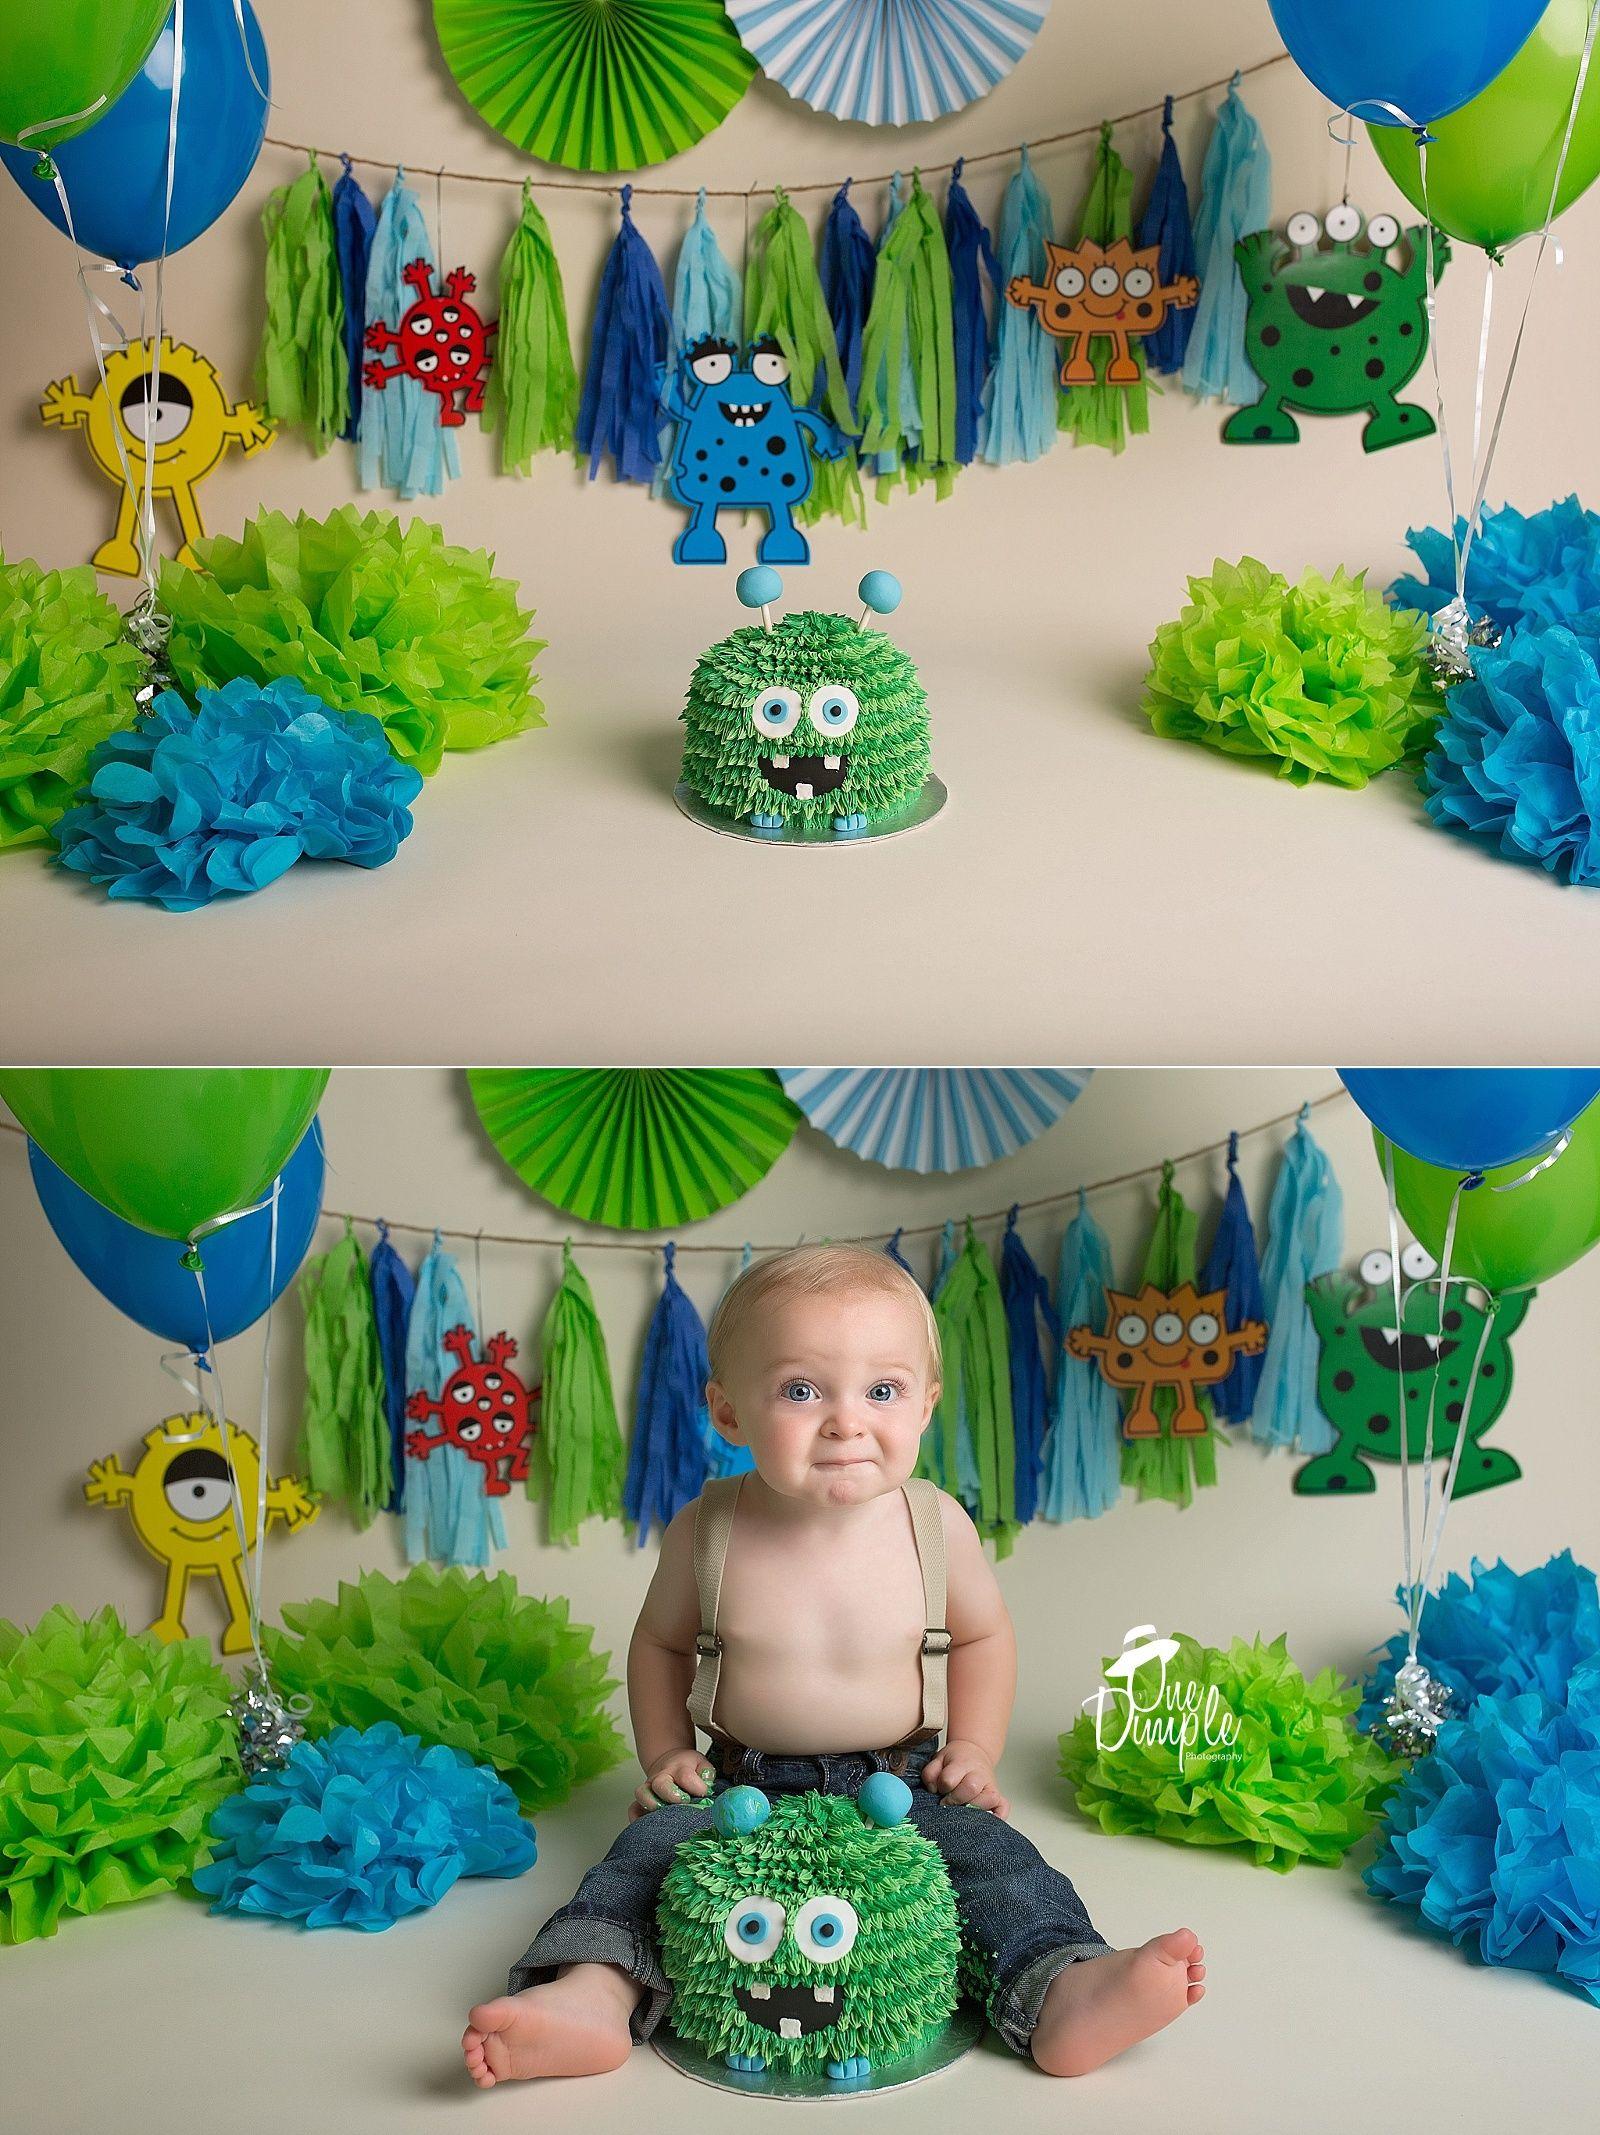 Flower Mound Cake Smash Session Monster 1st Birthdays Monster Birthday Parties Little Monster Birthday